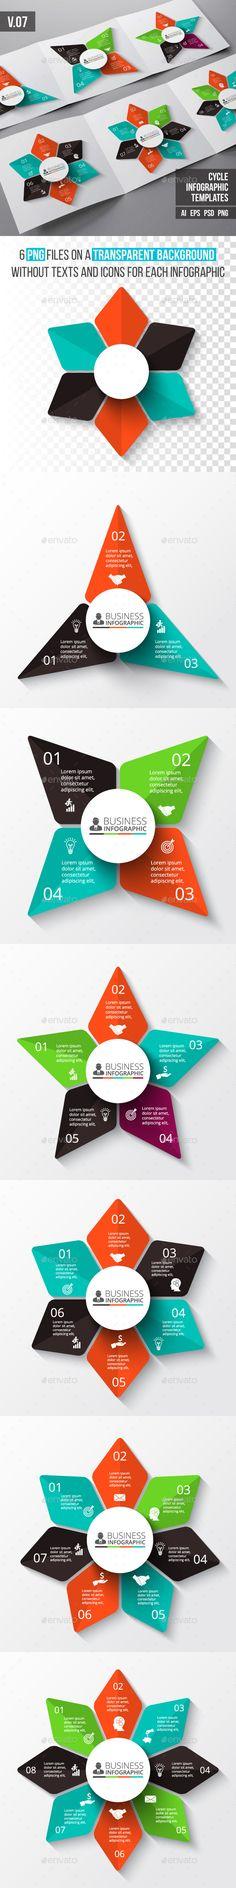 Infographic Templates PSD, Vector EPS, AI Illustrator